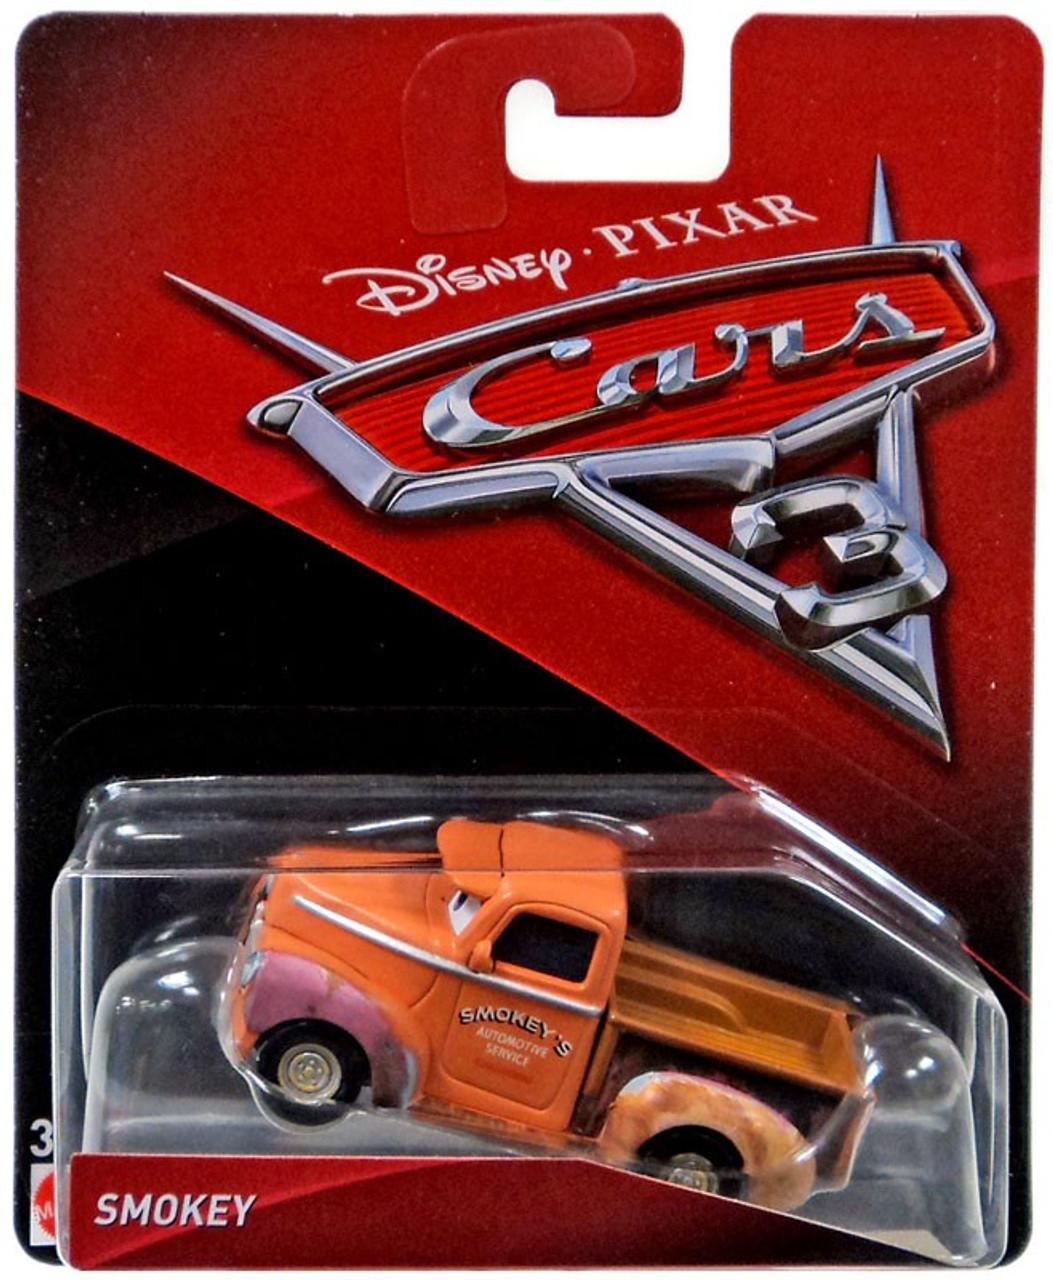 Disney Pixar Cars Cars 3 Smokey 155 Diecast Car Mattel Toys Toywiz